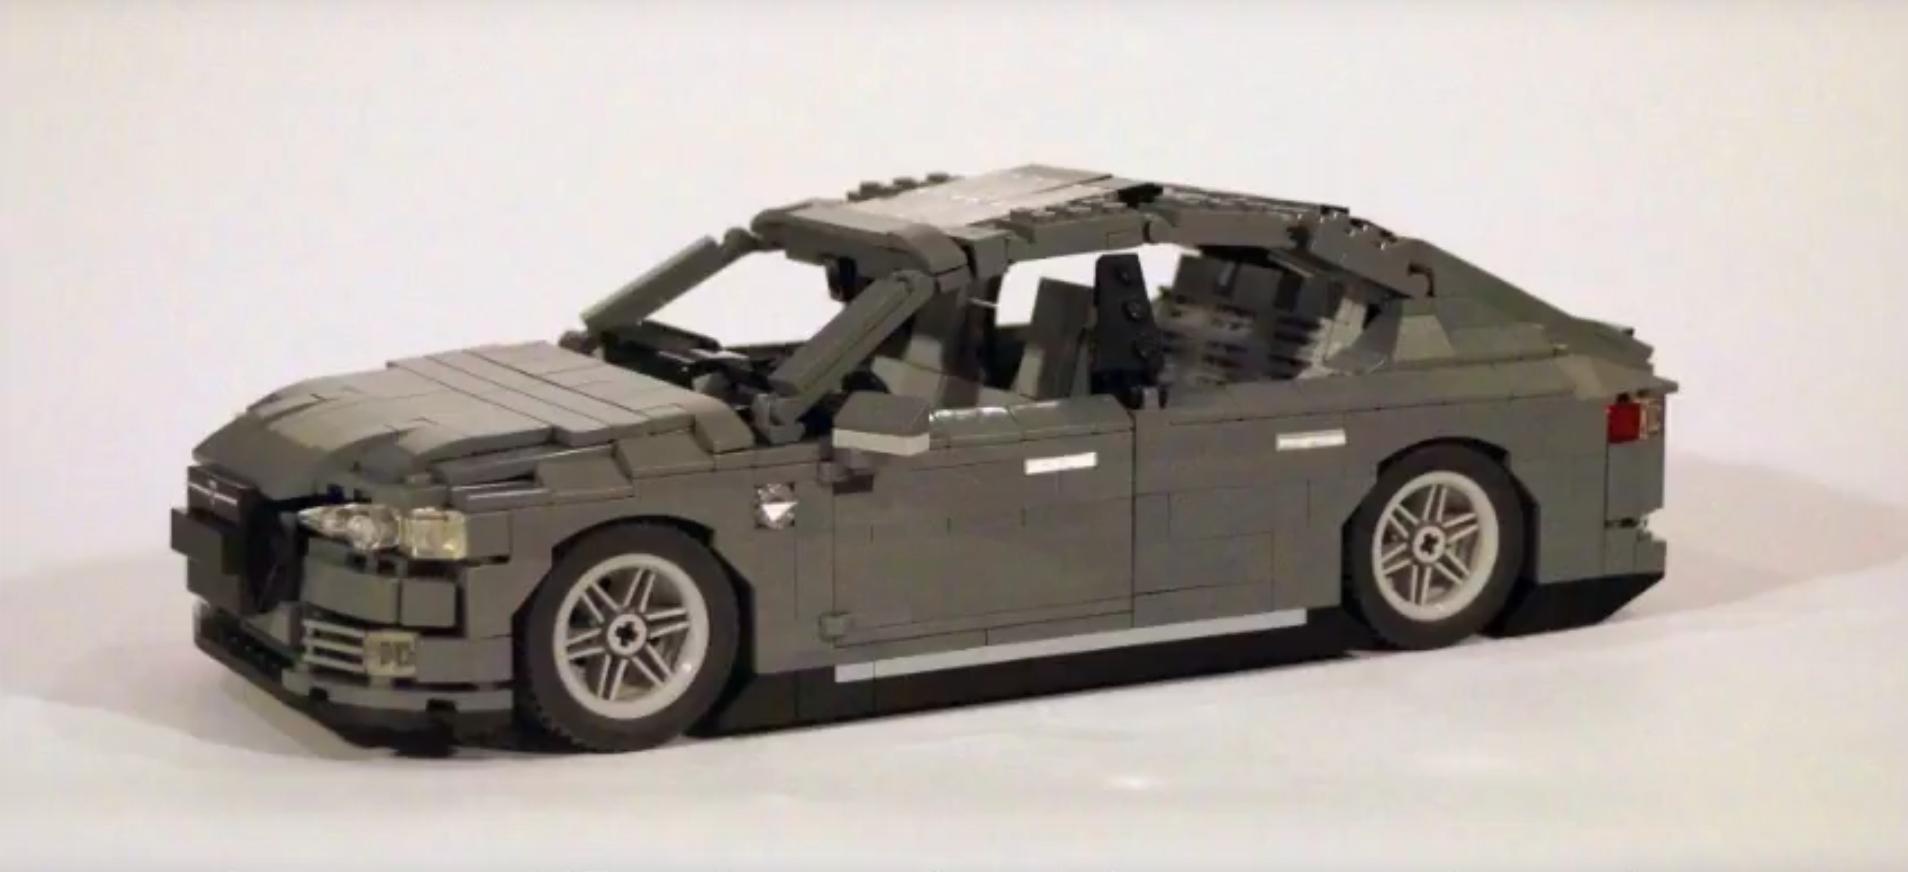 Model S lego